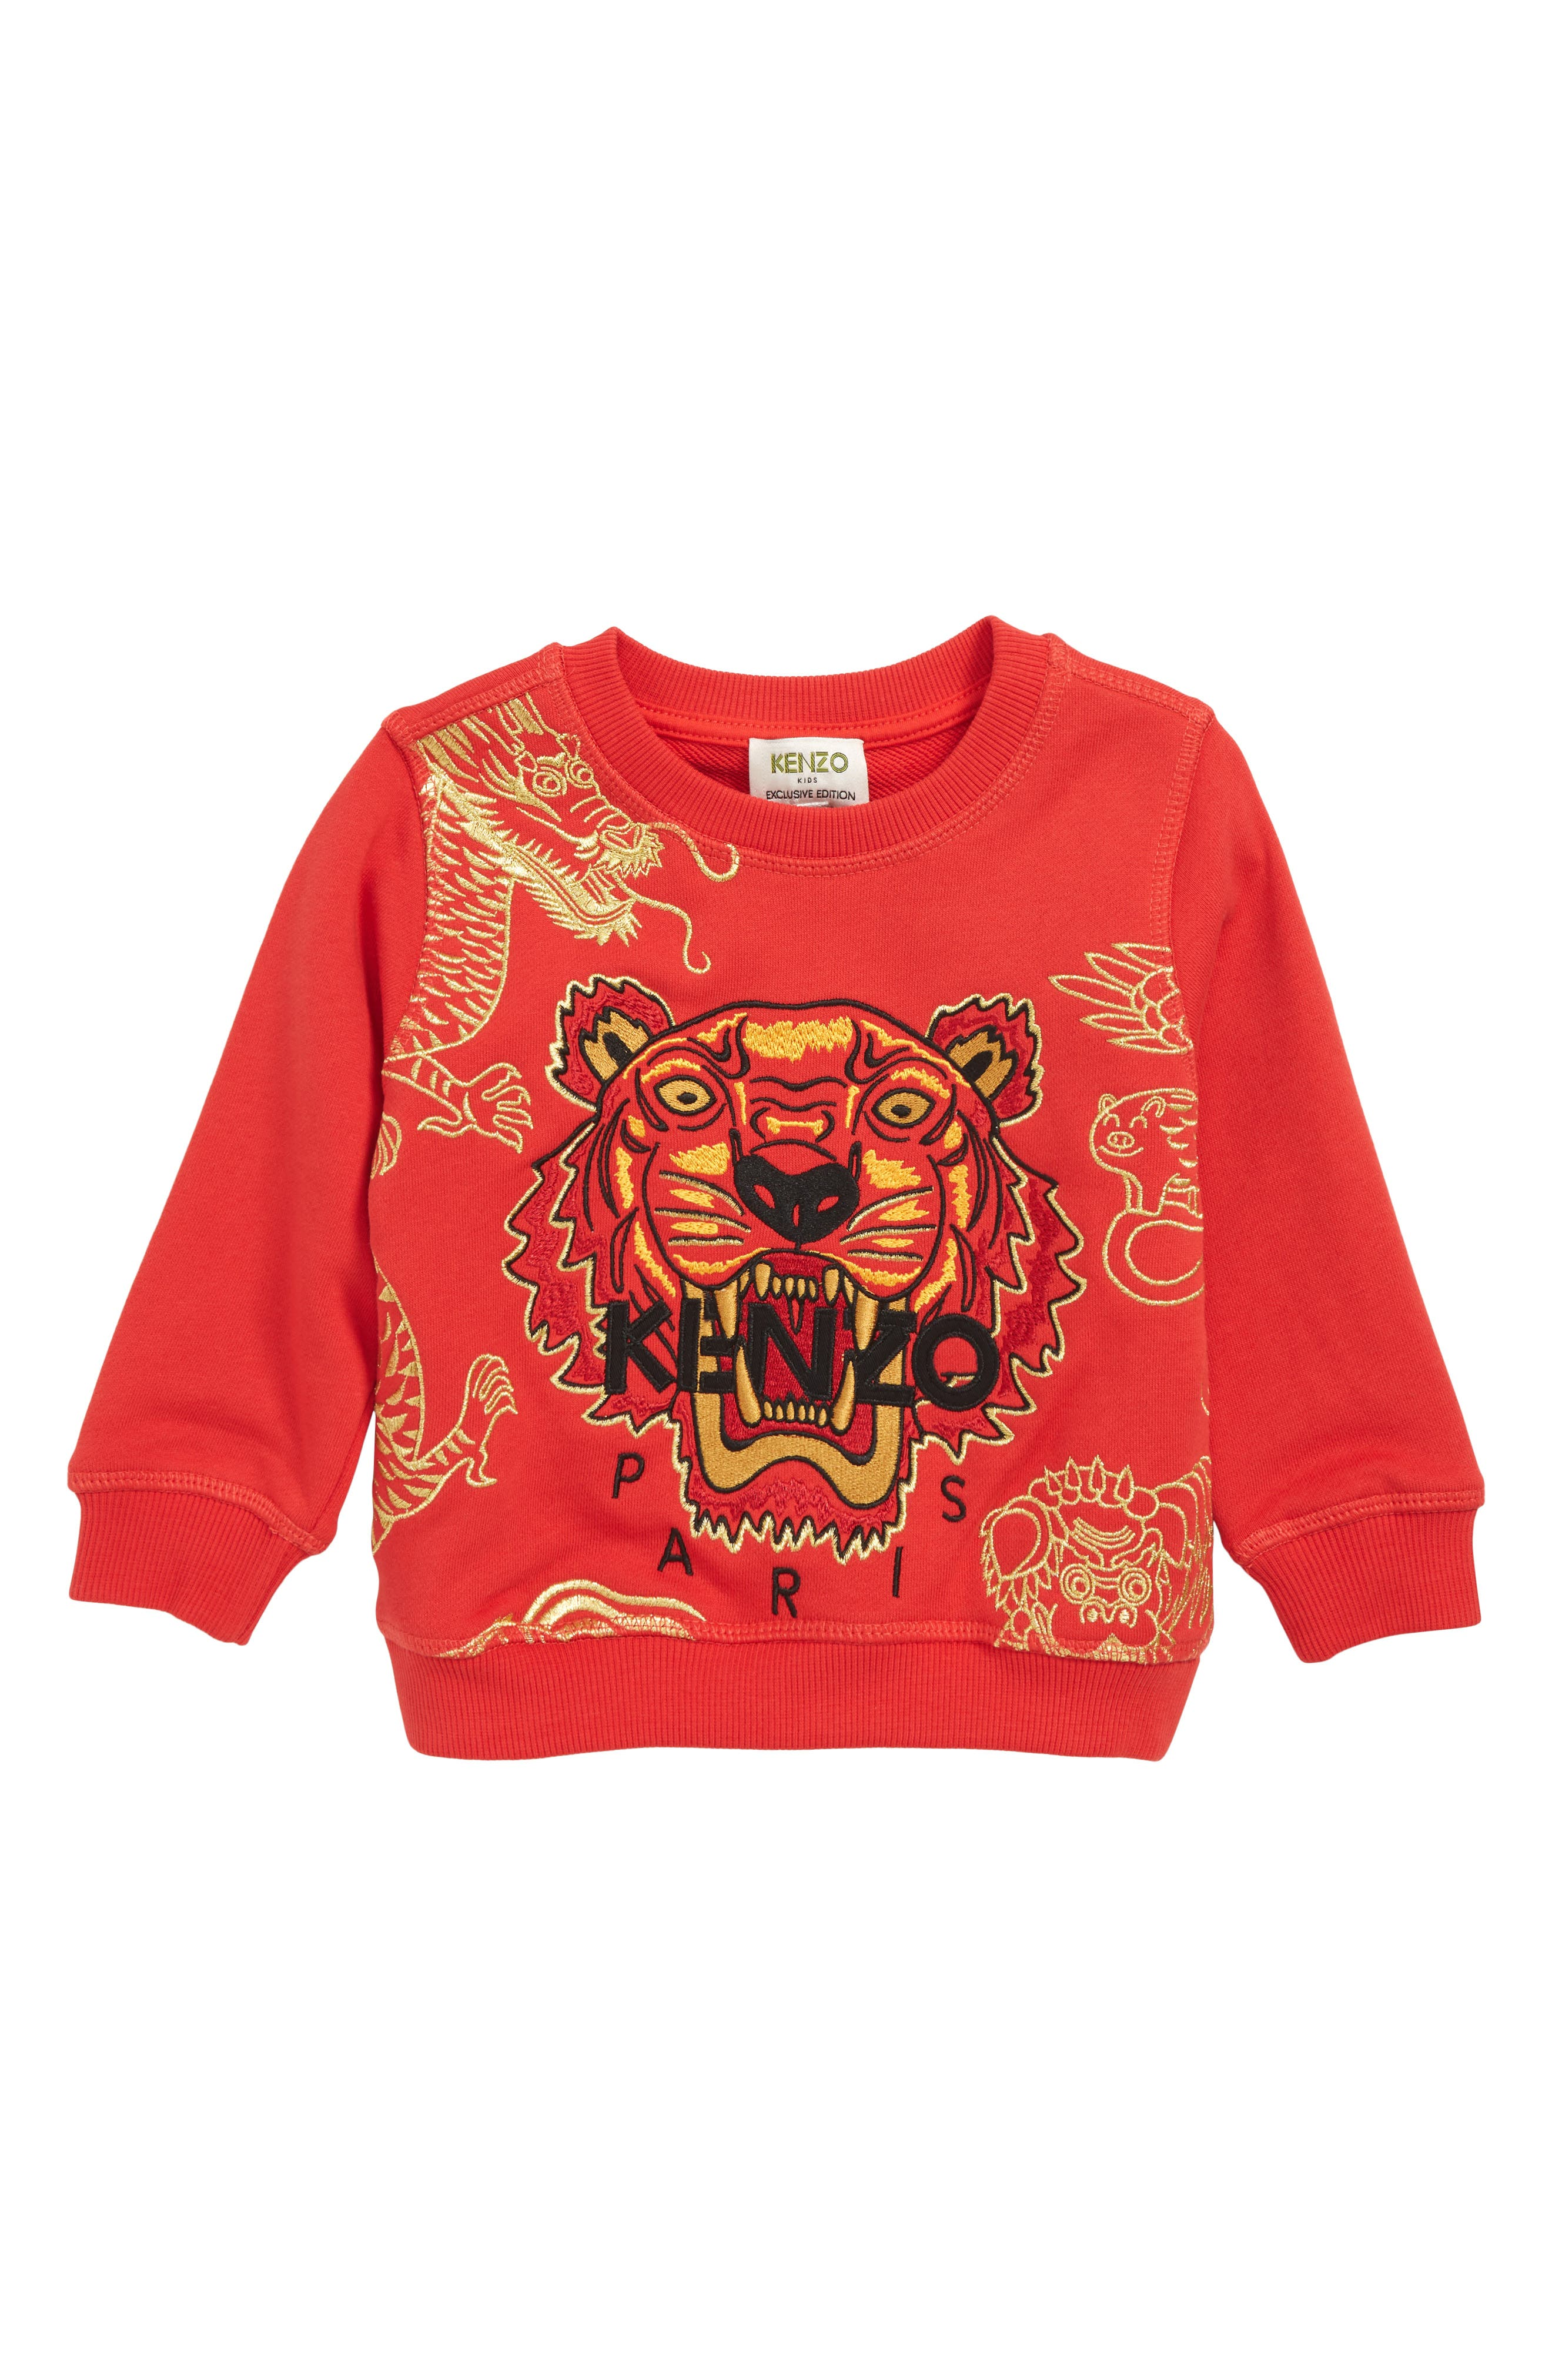 Toddler Boys Kenzo Embroidered Tiger Logo Sweatshirt